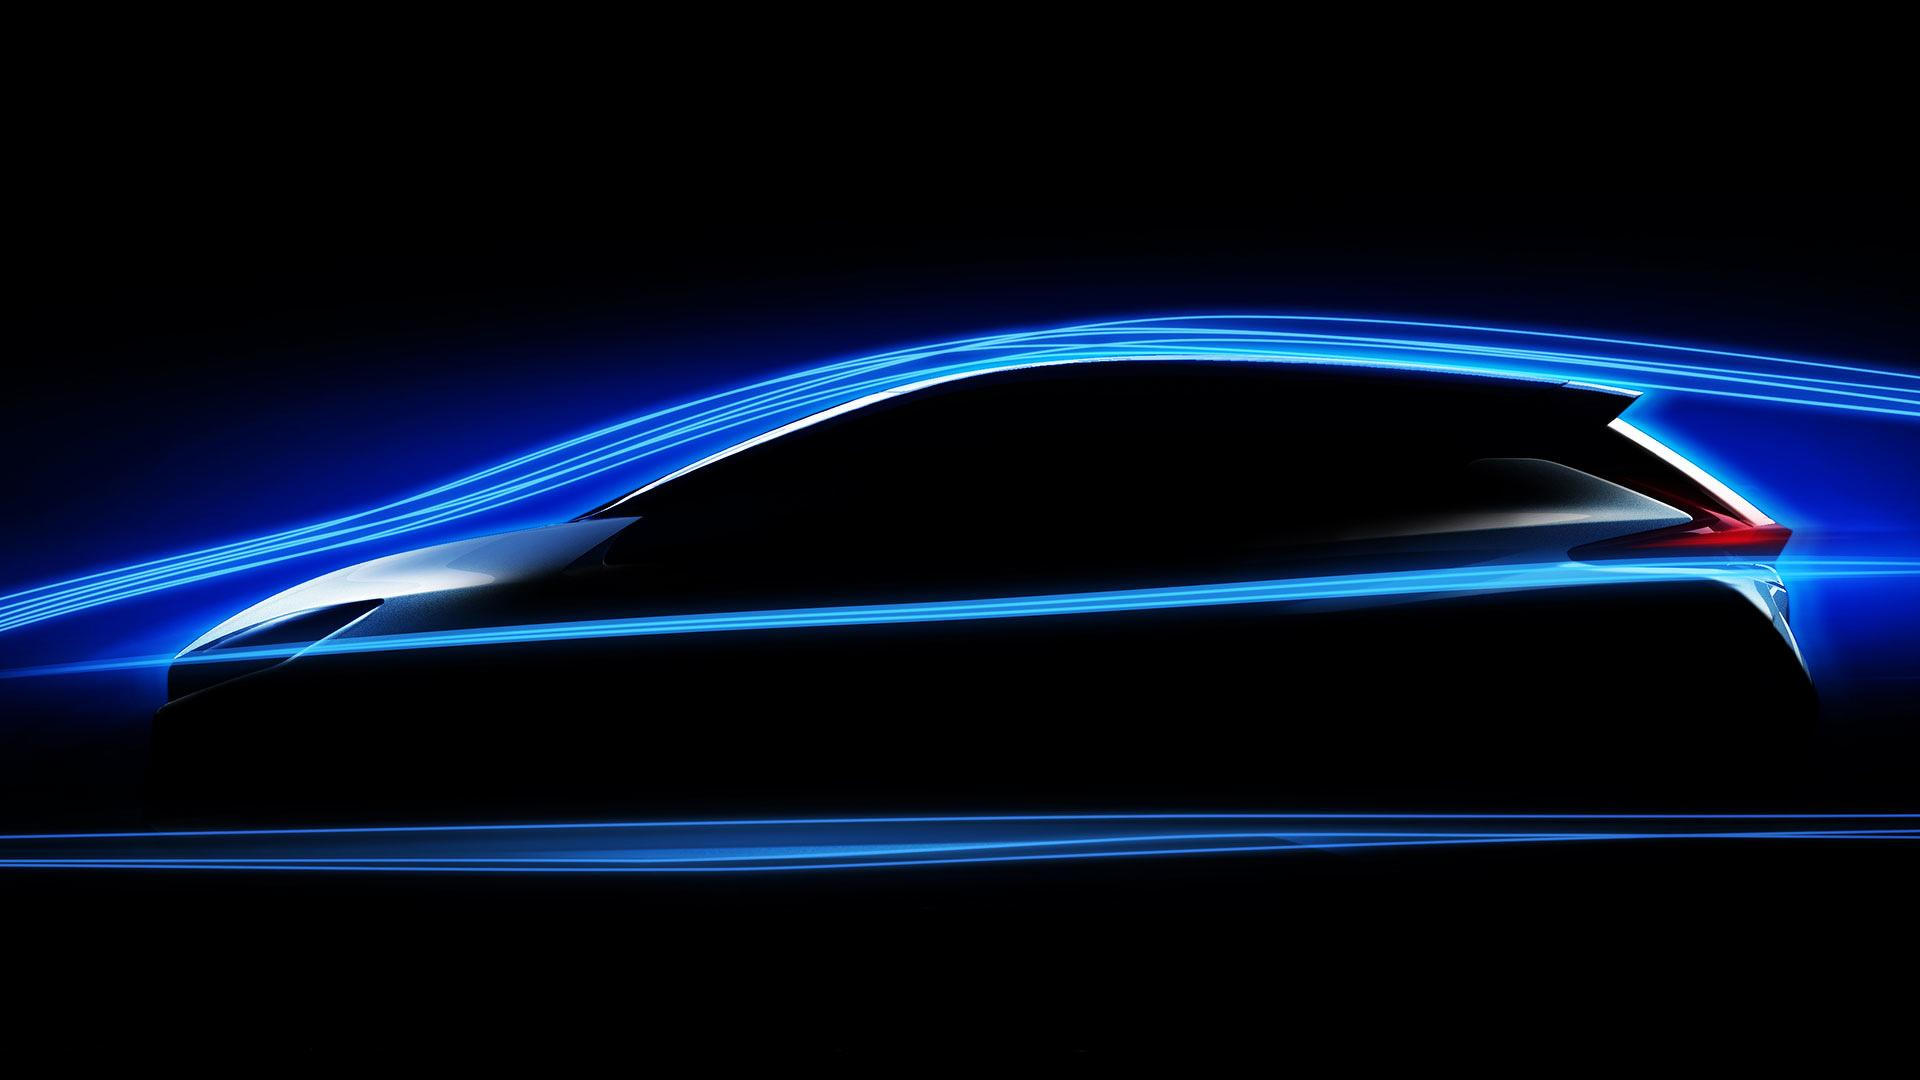 2018 nissan leaf is lower  more aerodynamic for improved range